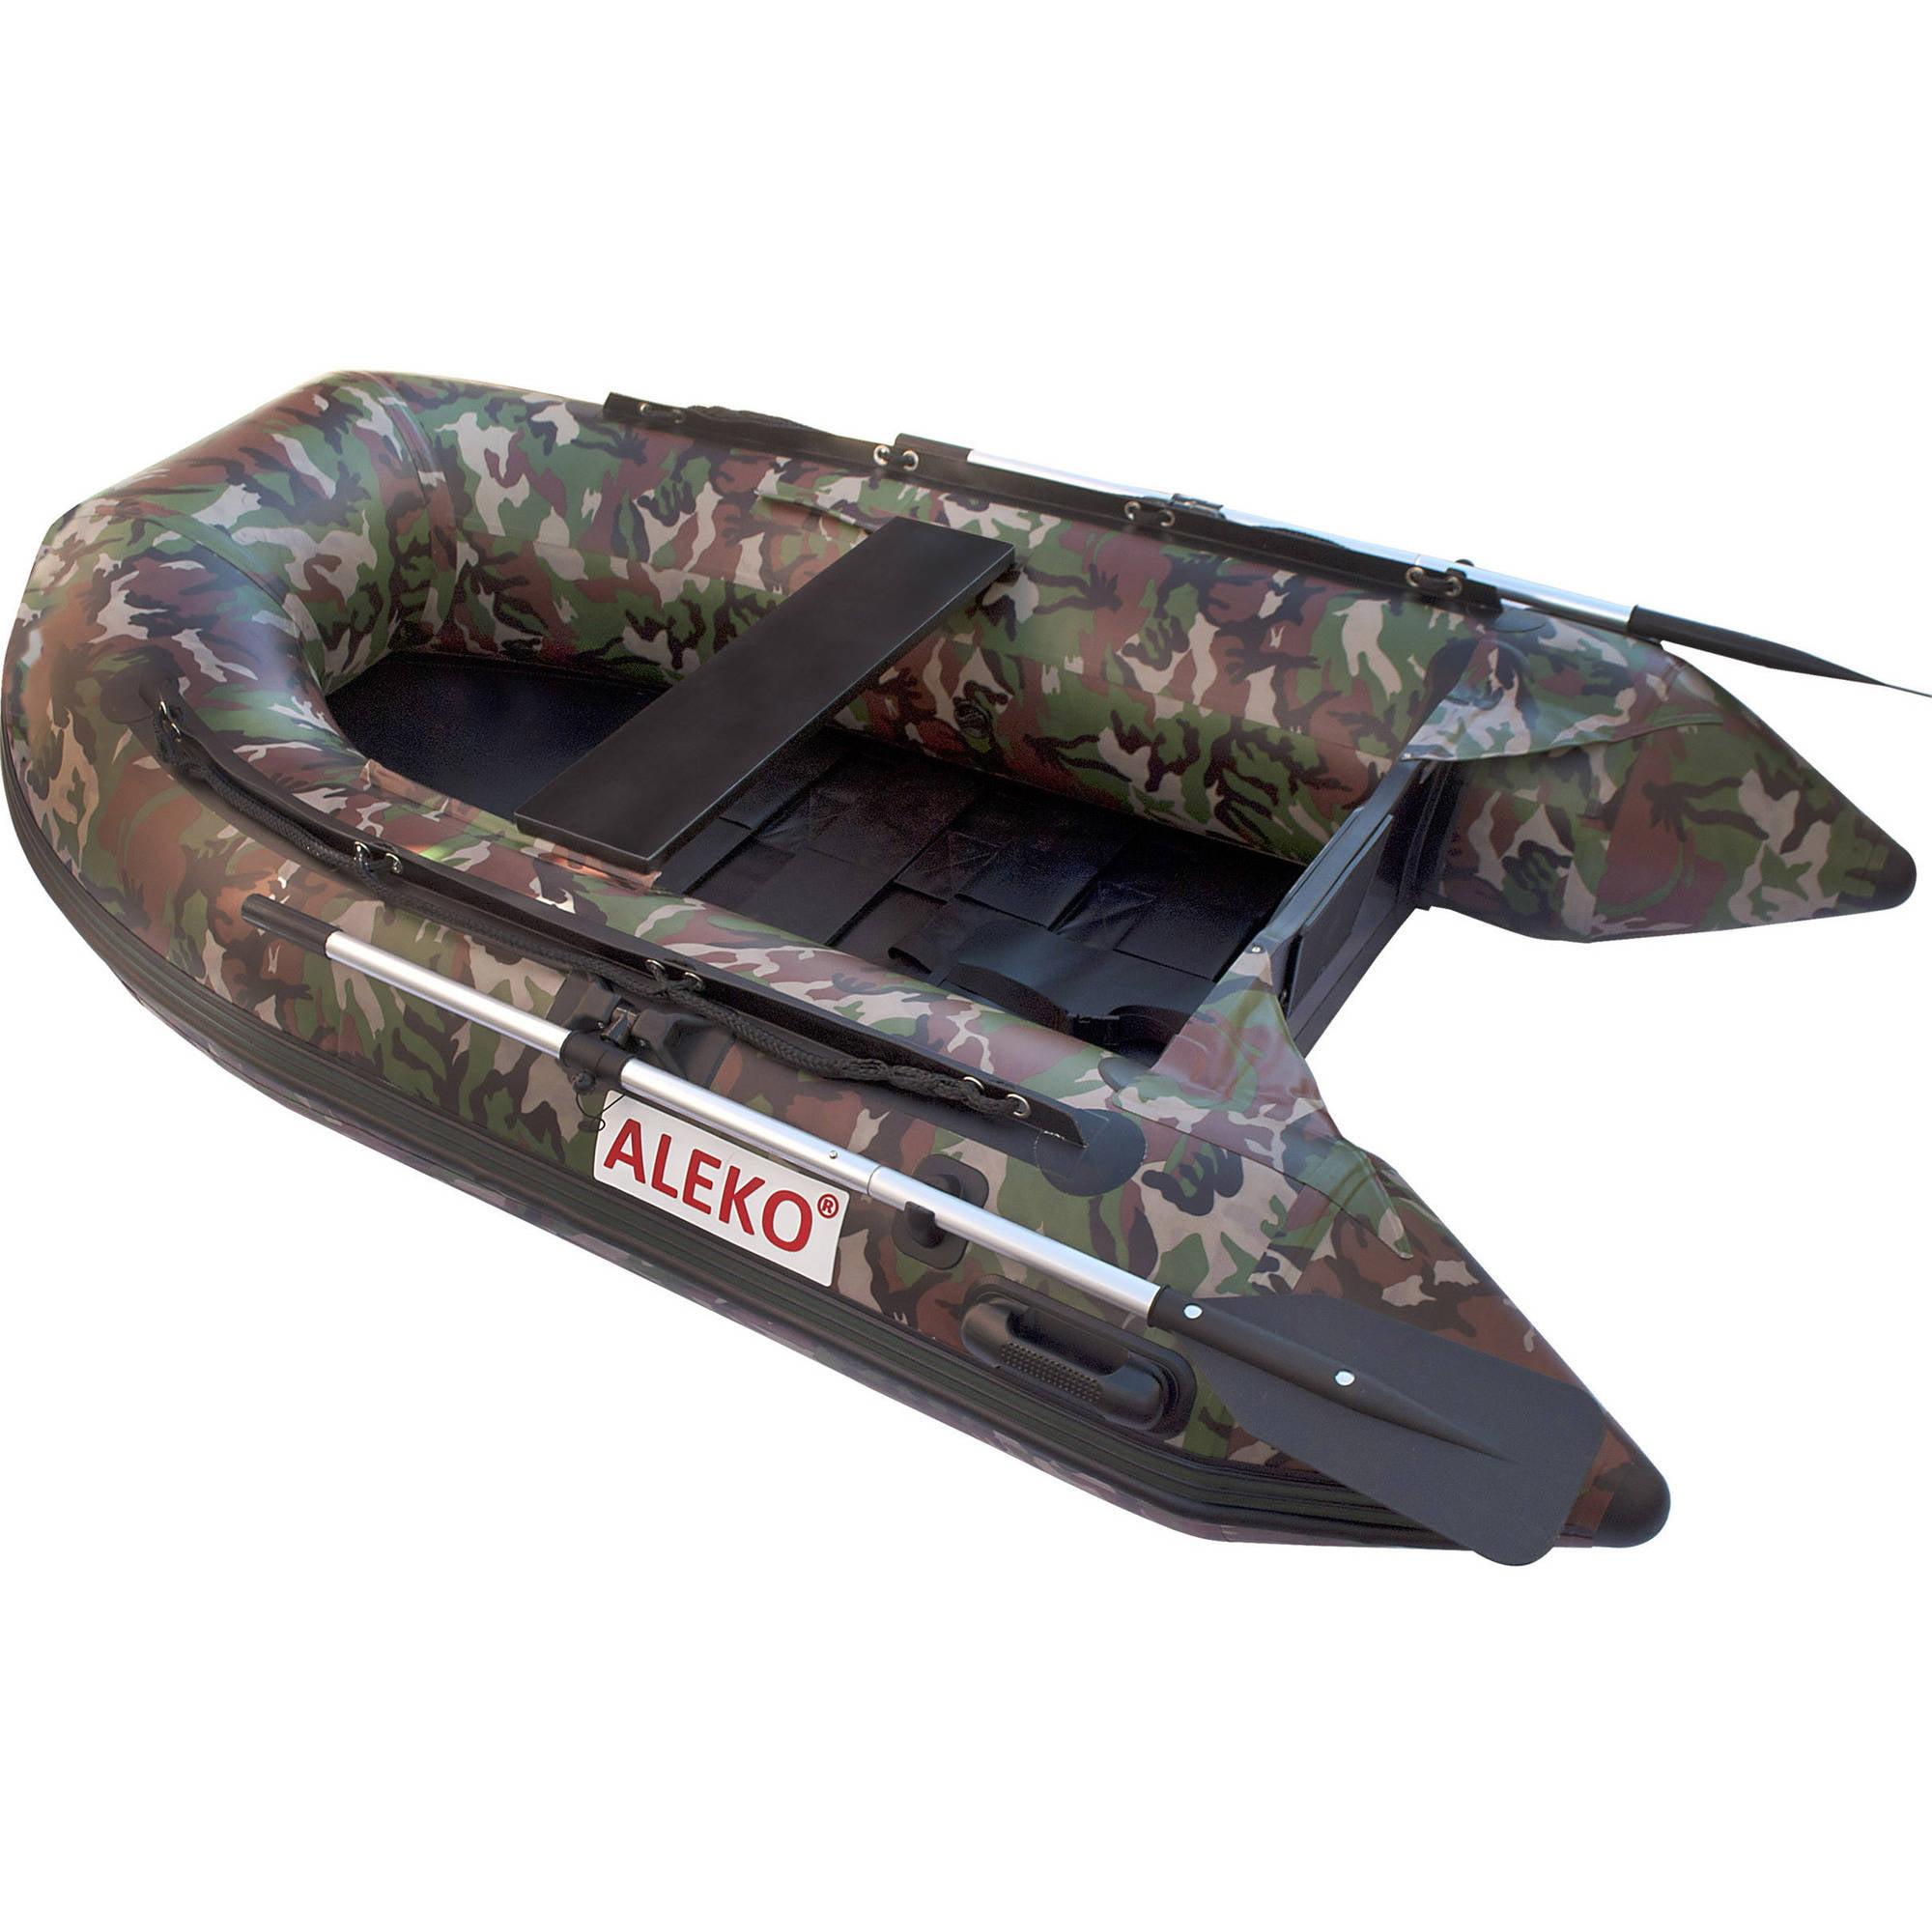 ALEKO BTSDSL250CM Inflatable Motor Fishing Boat Raft 8.4'...